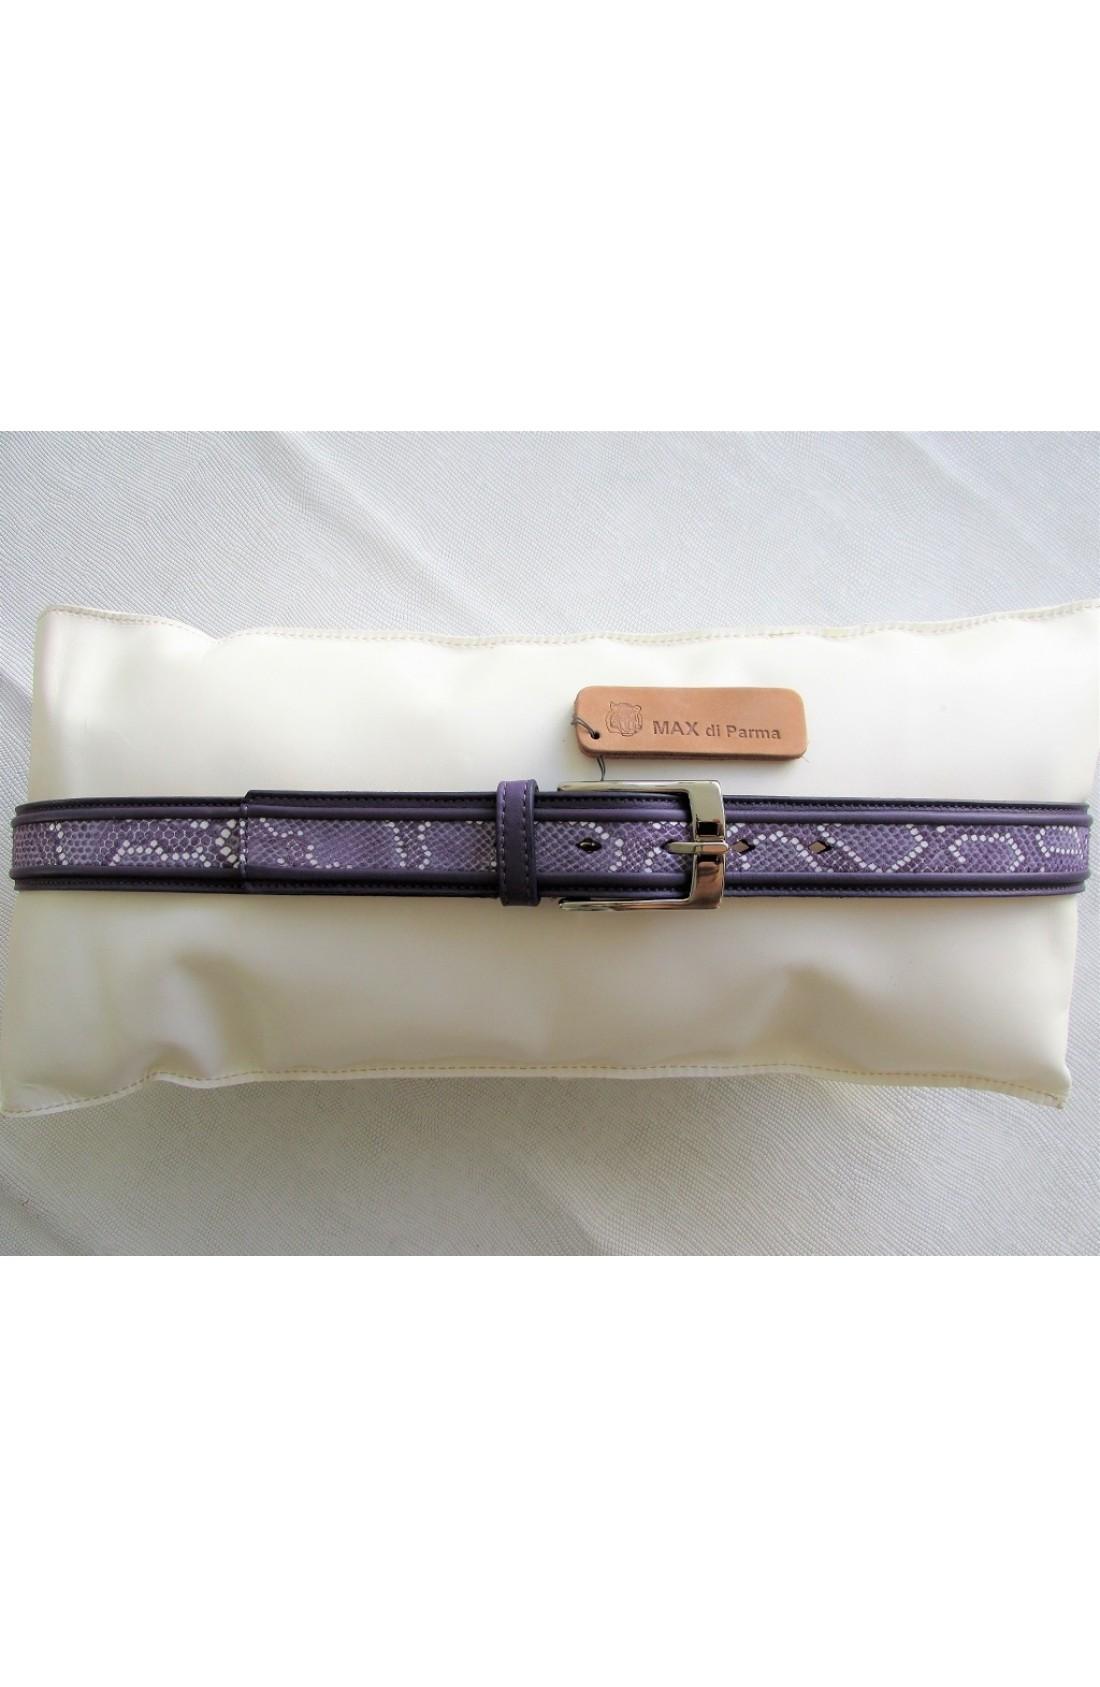 CINTURA SPECIALI art.401 MOUSSE mm.35 var.9 viola +PAILLET BOA livrea bianco (foto 1) fib. G 55